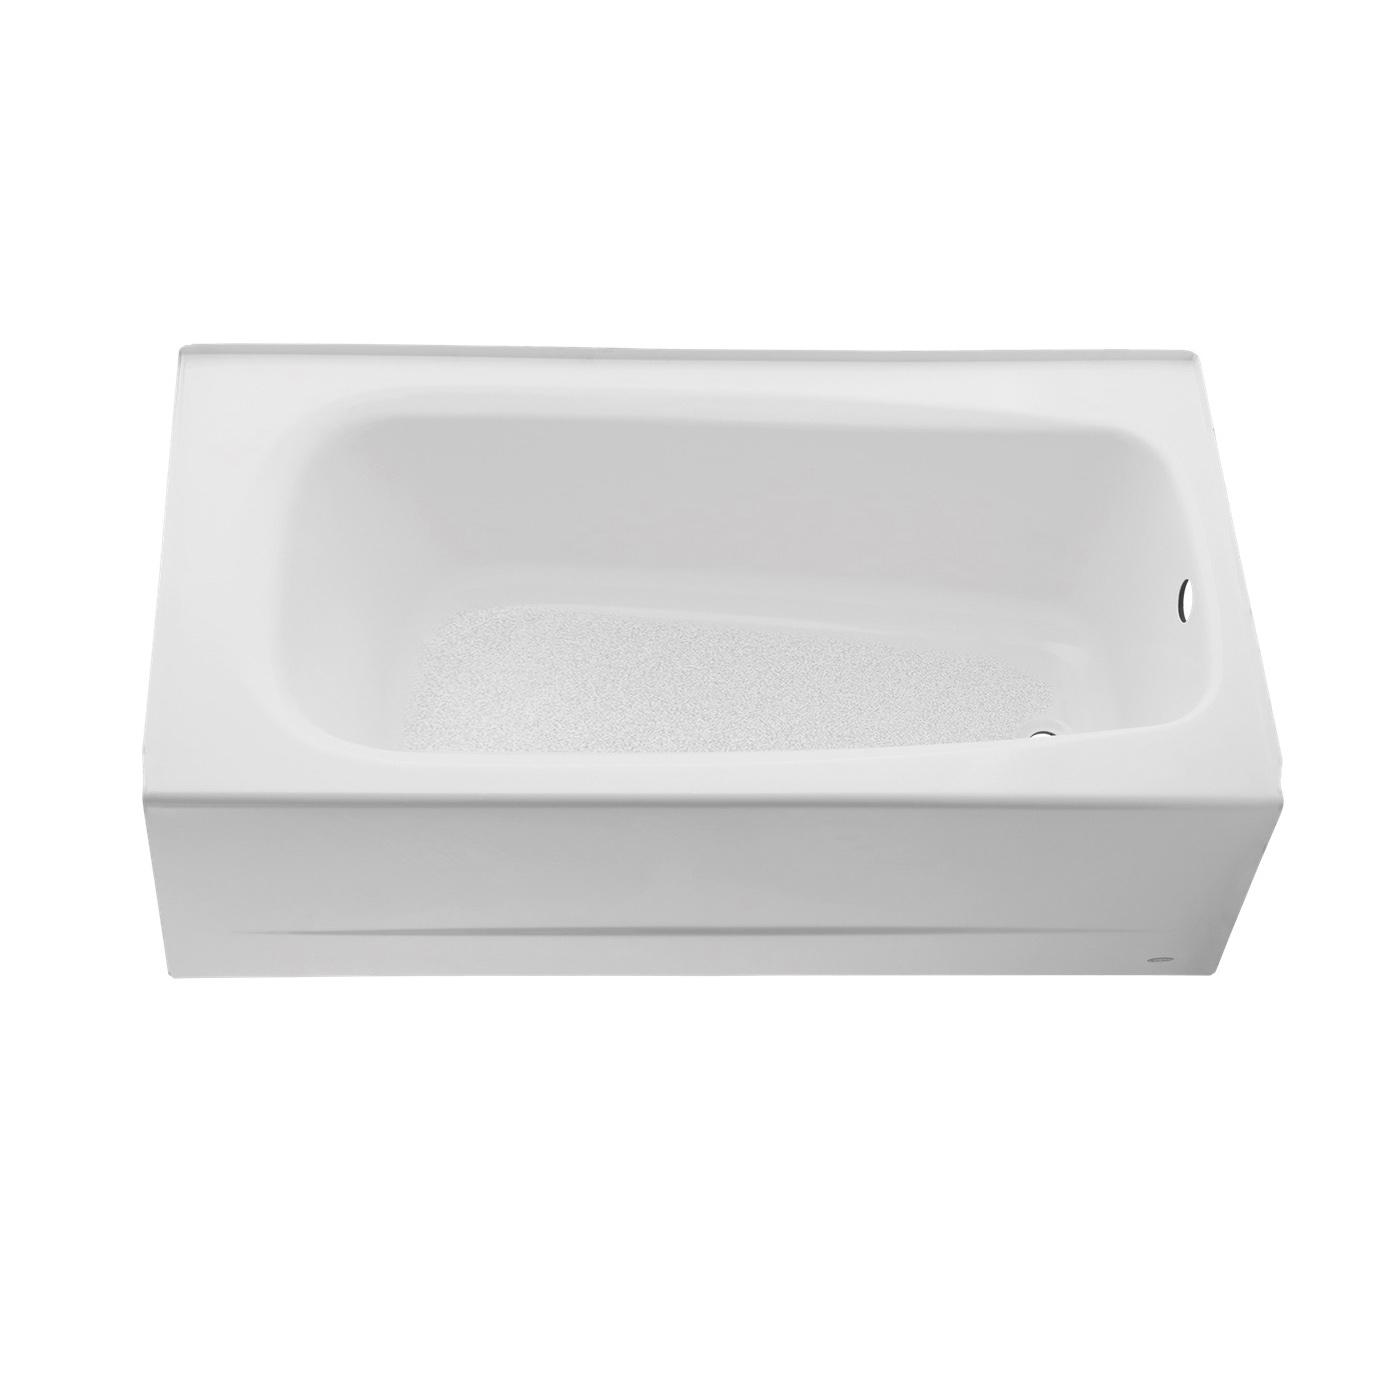 American Standard 2461.002.020 Bathtub, Cambridge™, Soaking, Rectangular Shape, 60 in L x 32 in W, Right Drain, White, Domestic